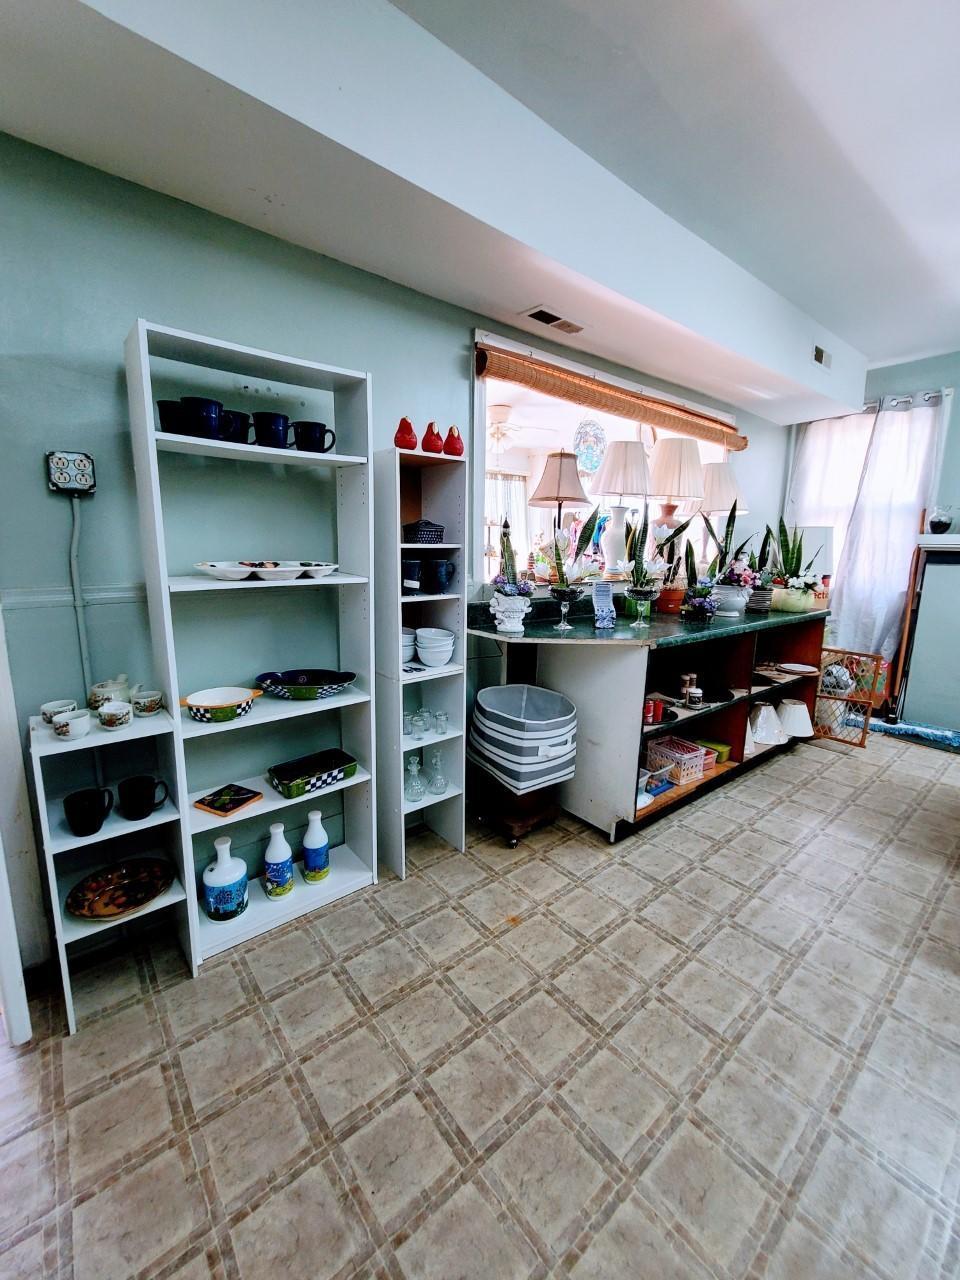 405 Hickman Road, Tabor City, North Carolina 28463, 3 Bedrooms Bedrooms, 10 Rooms Rooms,3 BathroomsBathrooms,Single family residence,For sale,Hickman,100263752